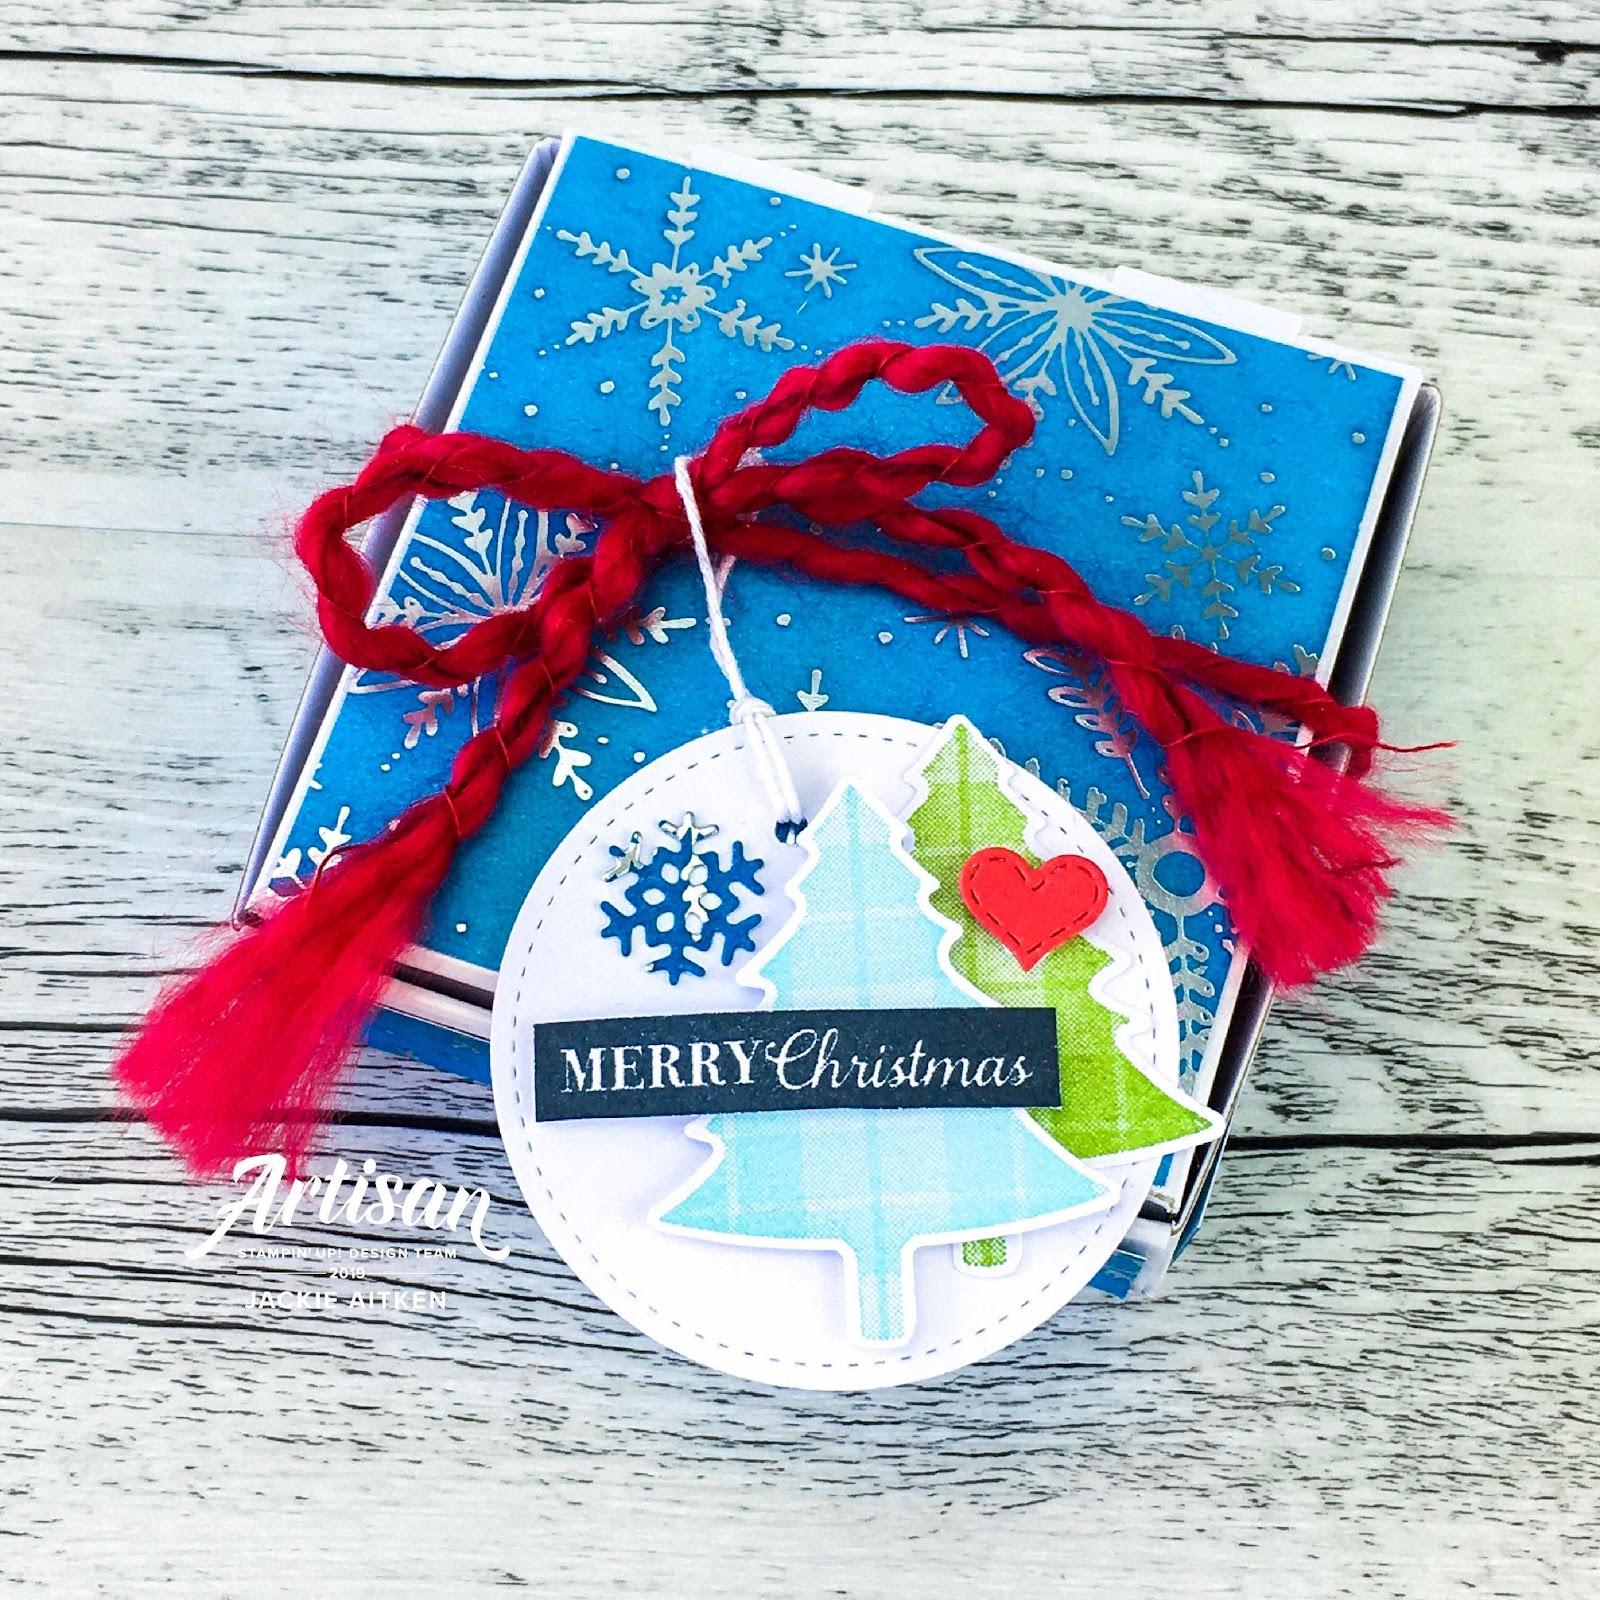 Christmas Card, Holiday Festival, OSAT Blog Hop, Christmas Rose, Holly Jolly Christmas, Christmas Gleaming, Mini Pizza Box